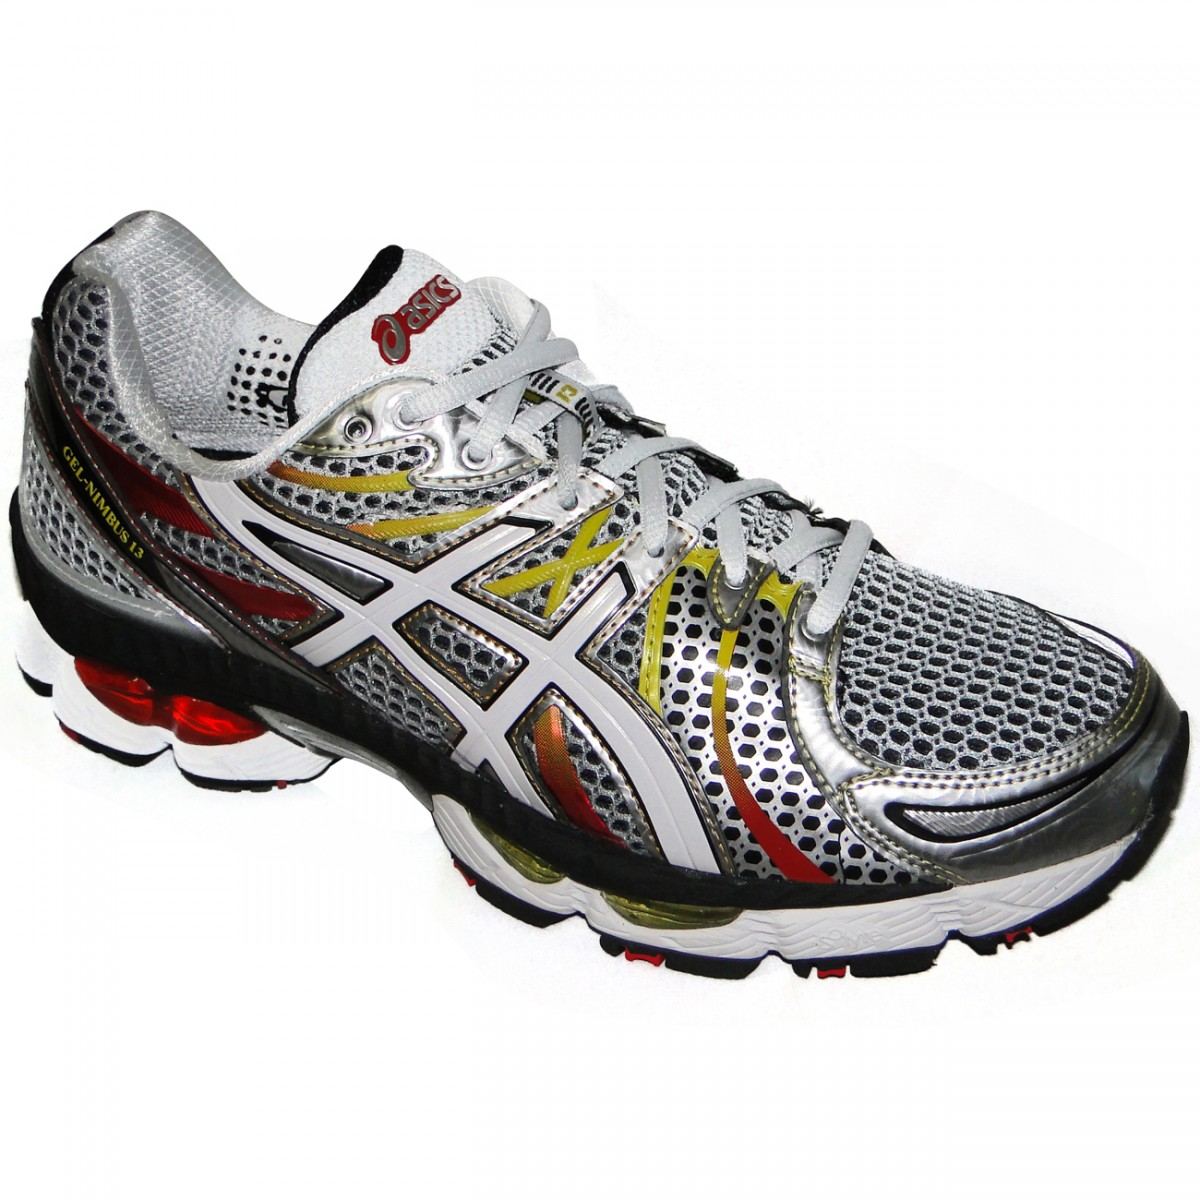 TENIS ASICS GEL-NIMBUS 13 2543 - PRATA BRANCO - Chuteira Nike ... da522dd5d6ea8